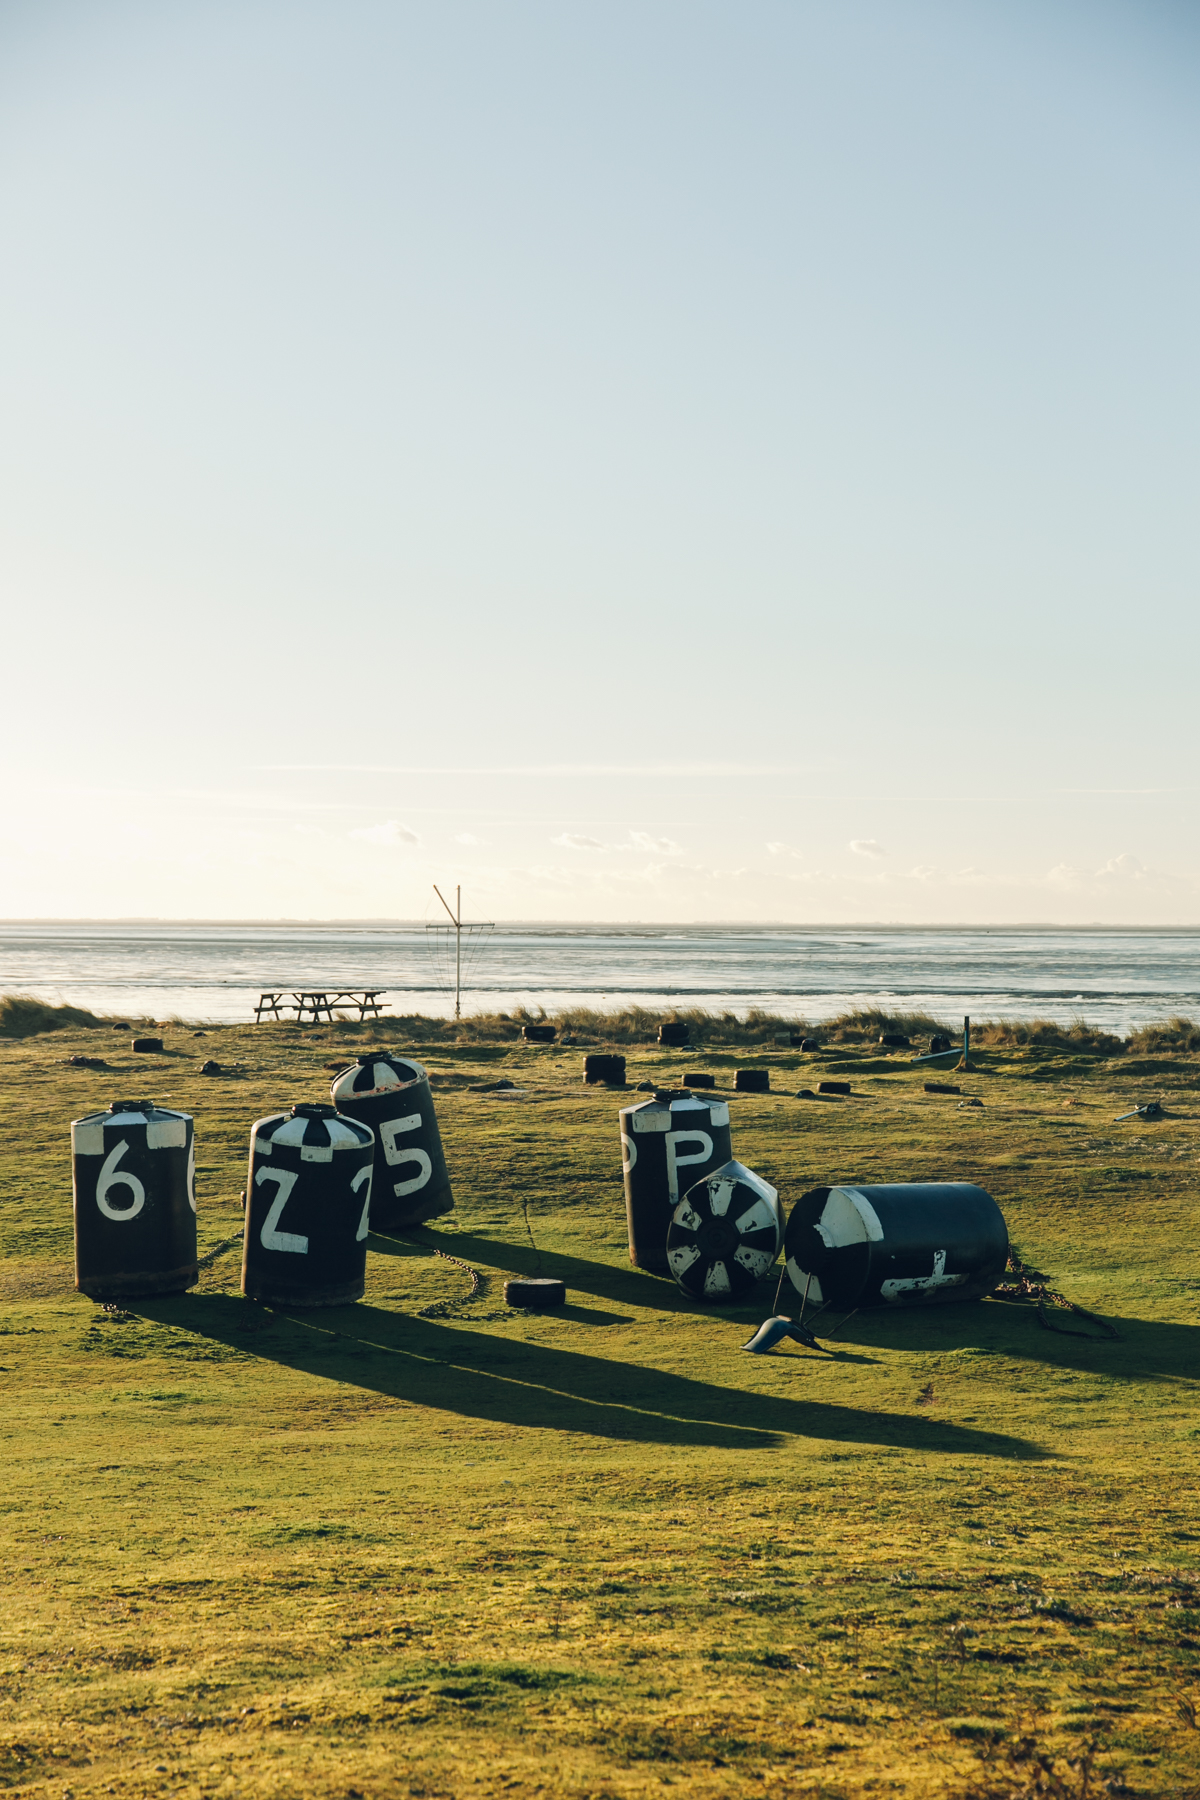 Snettisham on the North Norfolk coast.